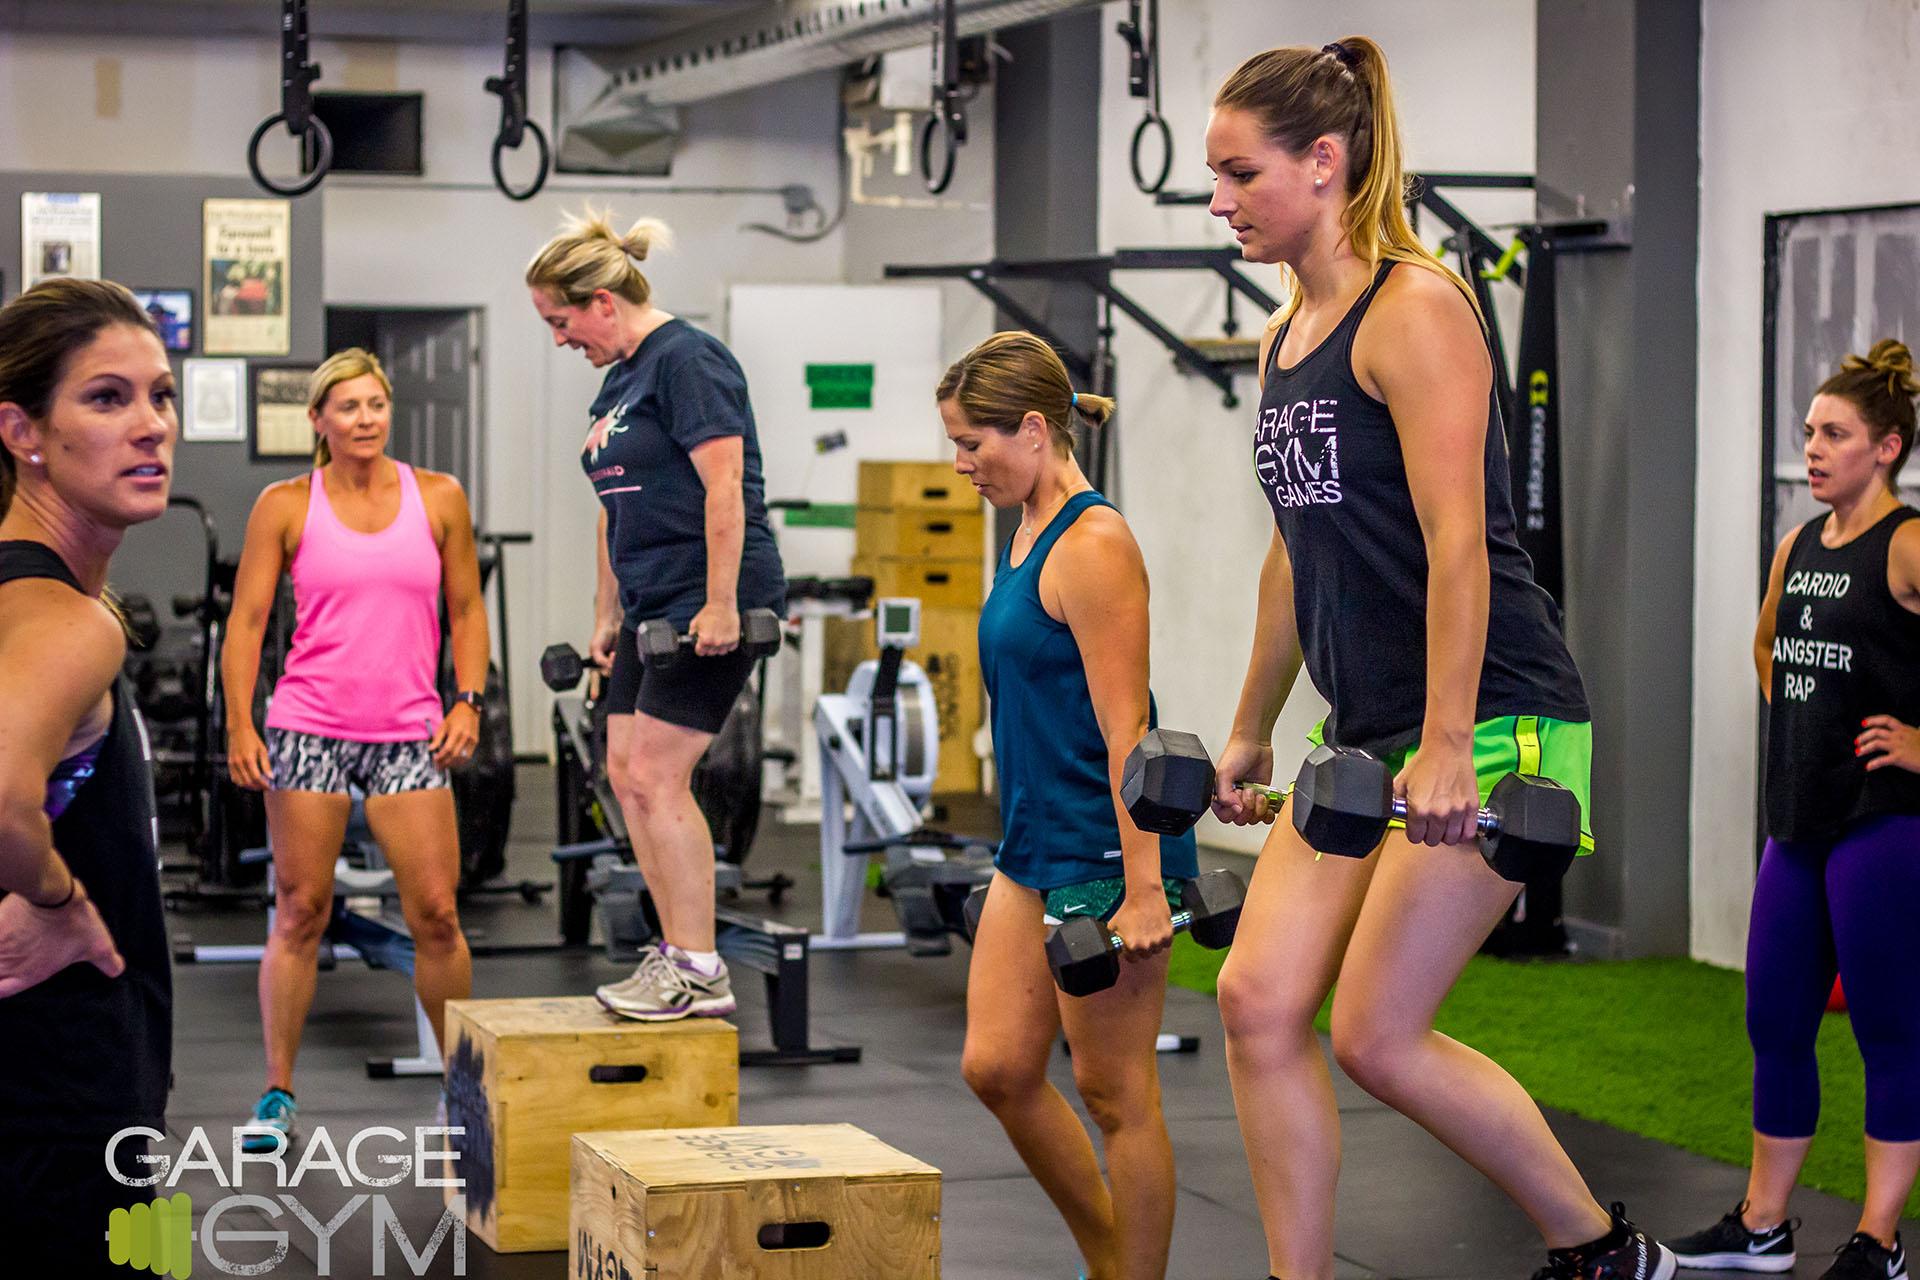 Garage gym girl garage gym girl instagram rep fitness strength